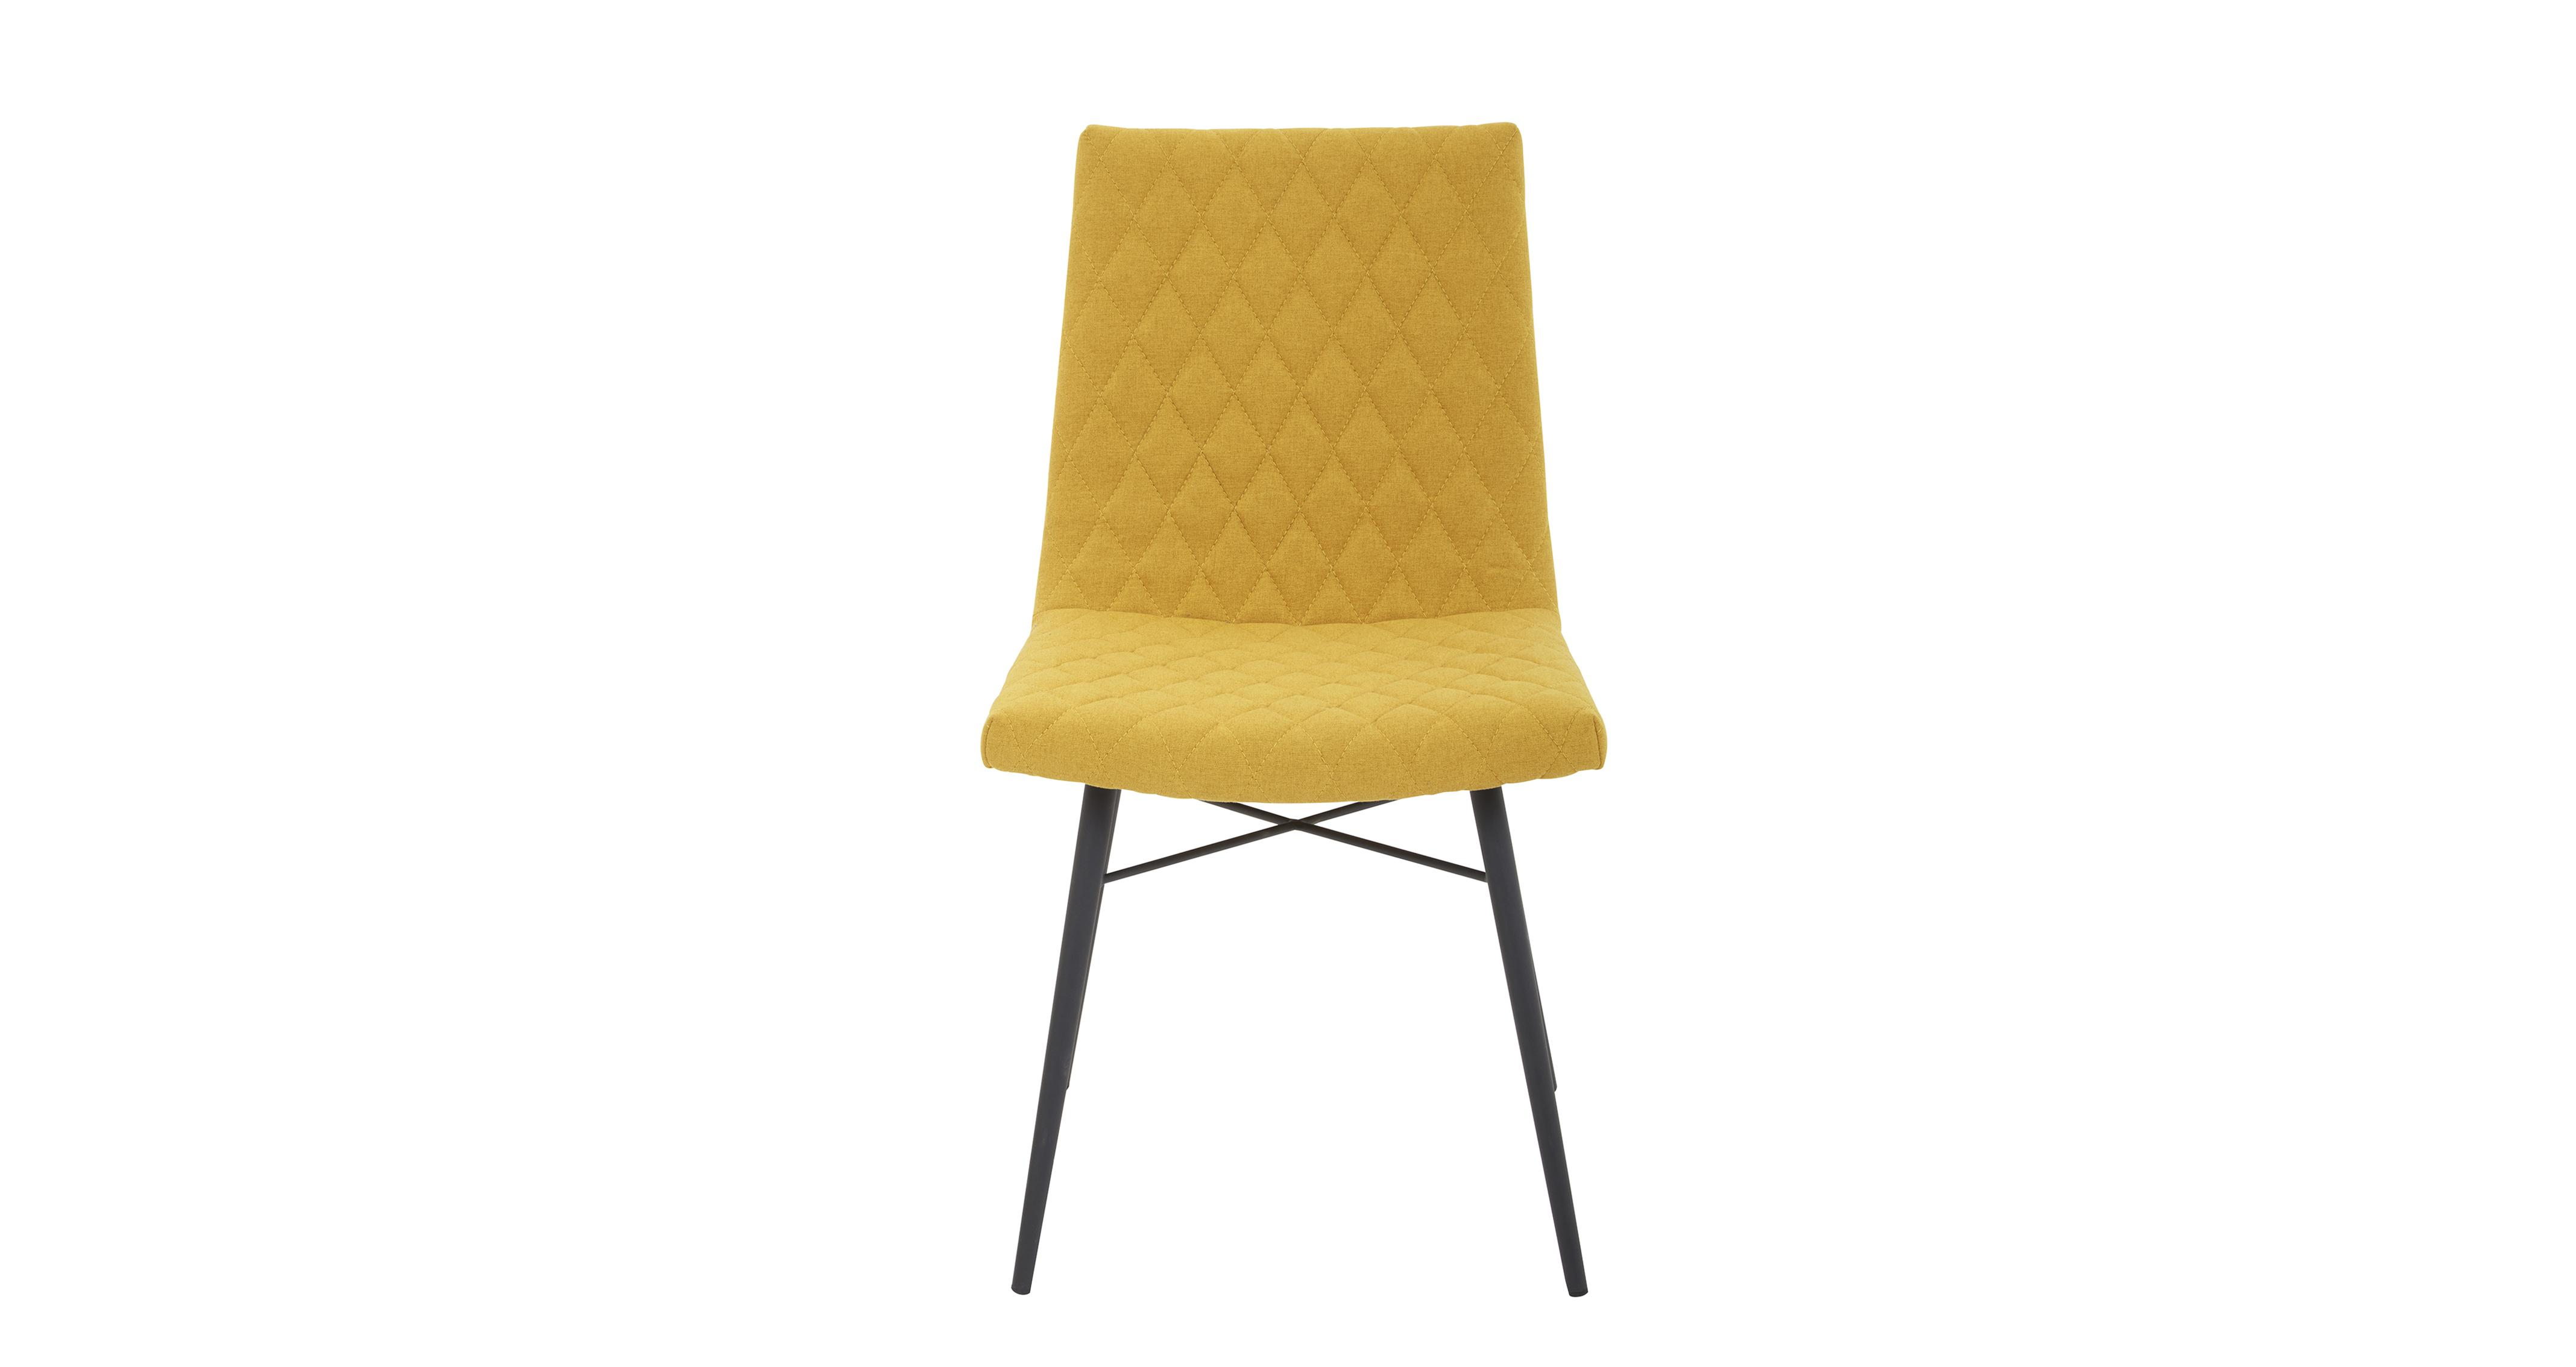 Wondrous Crete Faux Dining Chair Machost Co Dining Chair Design Ideas Machostcouk